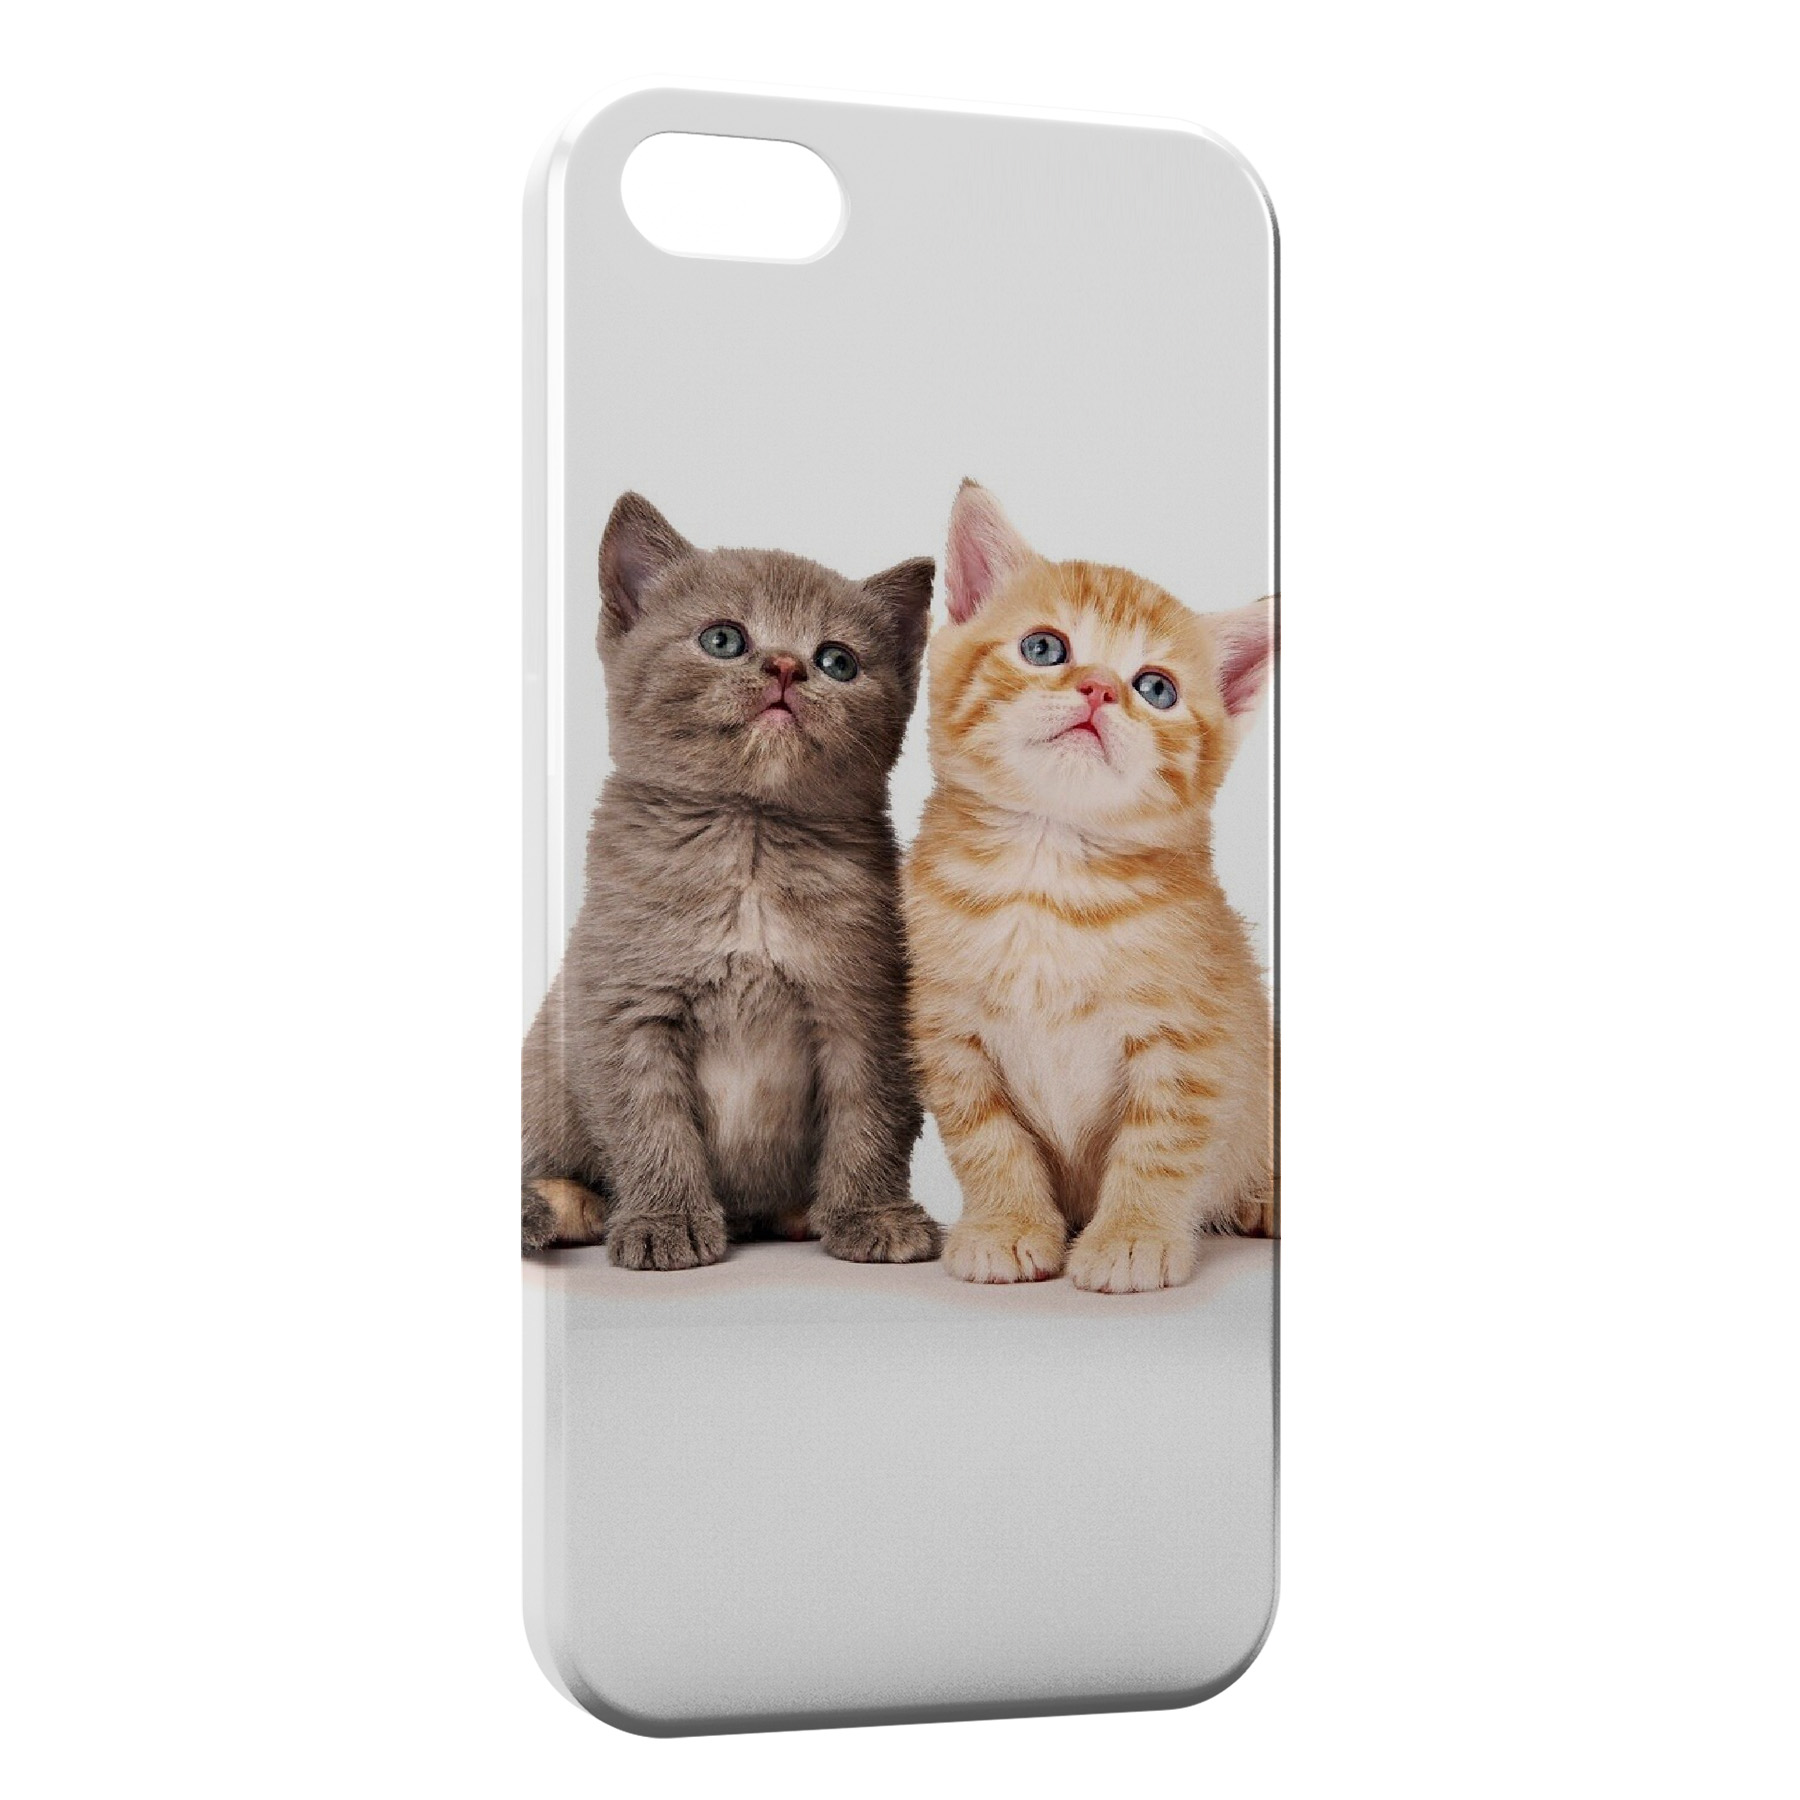 Coque iPhone 6 Plus & 6S Plus 2 Chats Mignons